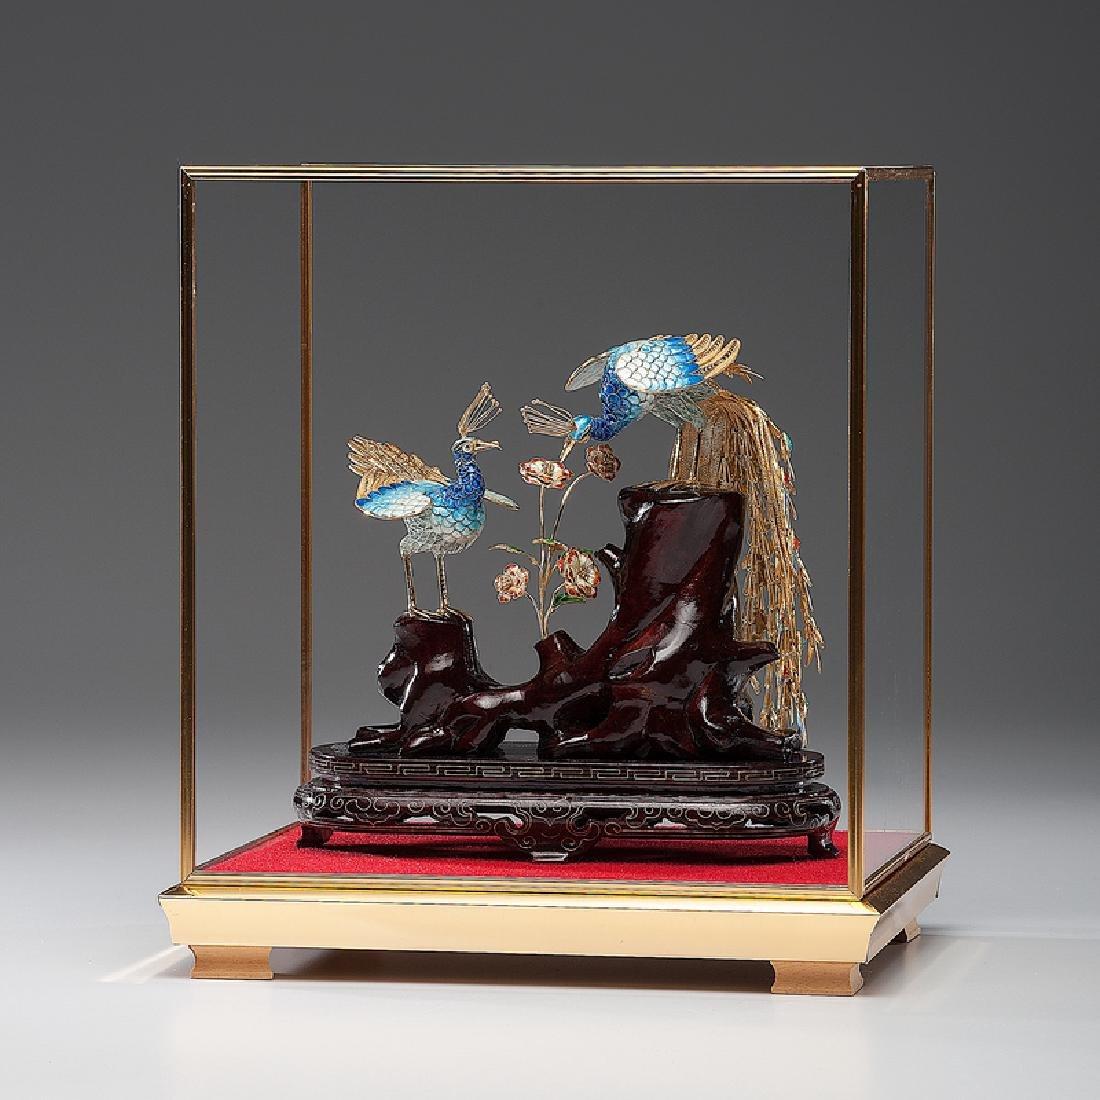 Chinese Enameled Silver Gilt Peacocks